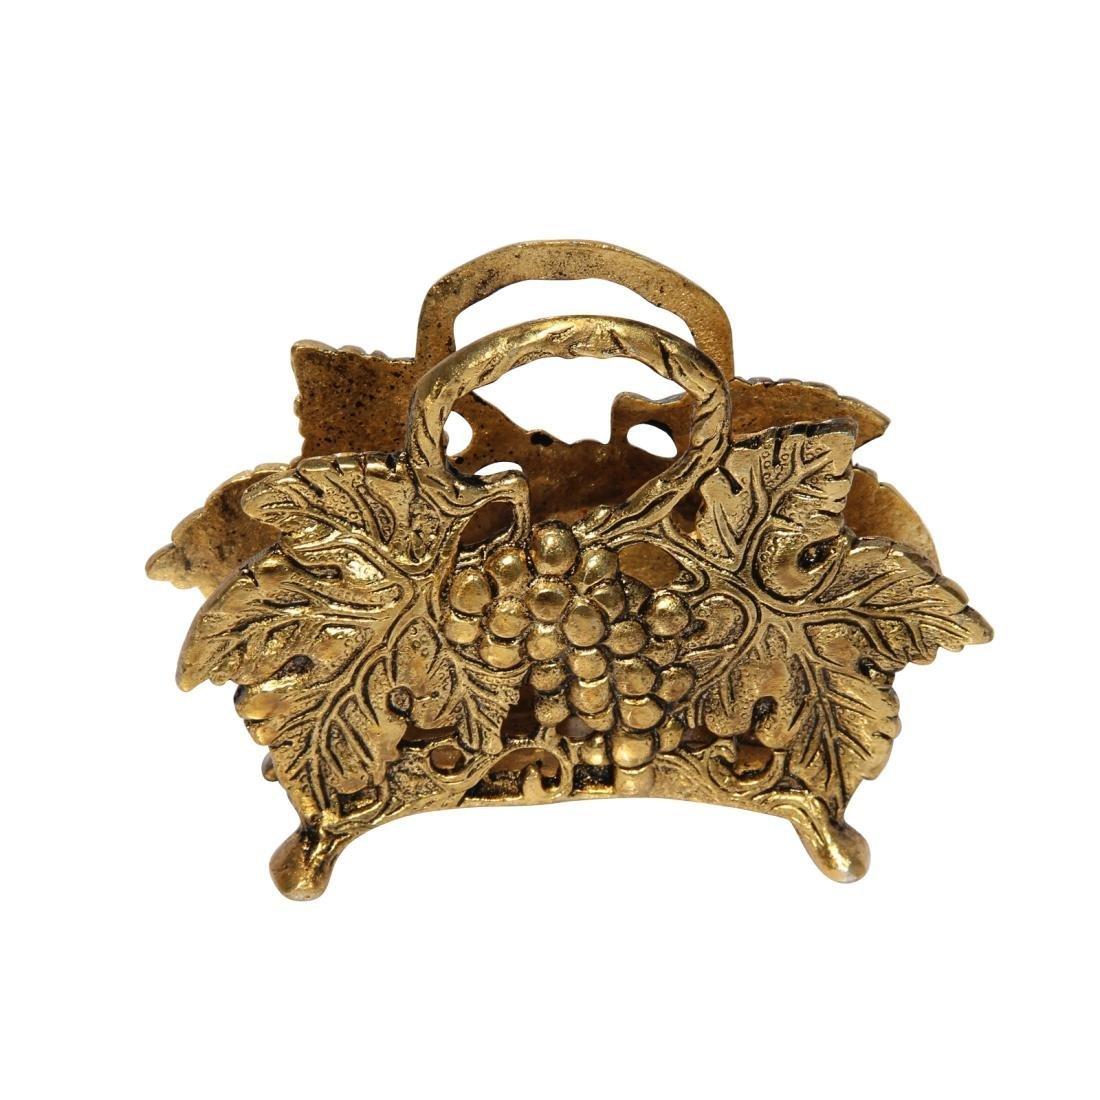 Handicrafts Paradise Napkin Holder Fruits Pattern in Metal Antique Golden Finish by Handicrafts Paradise